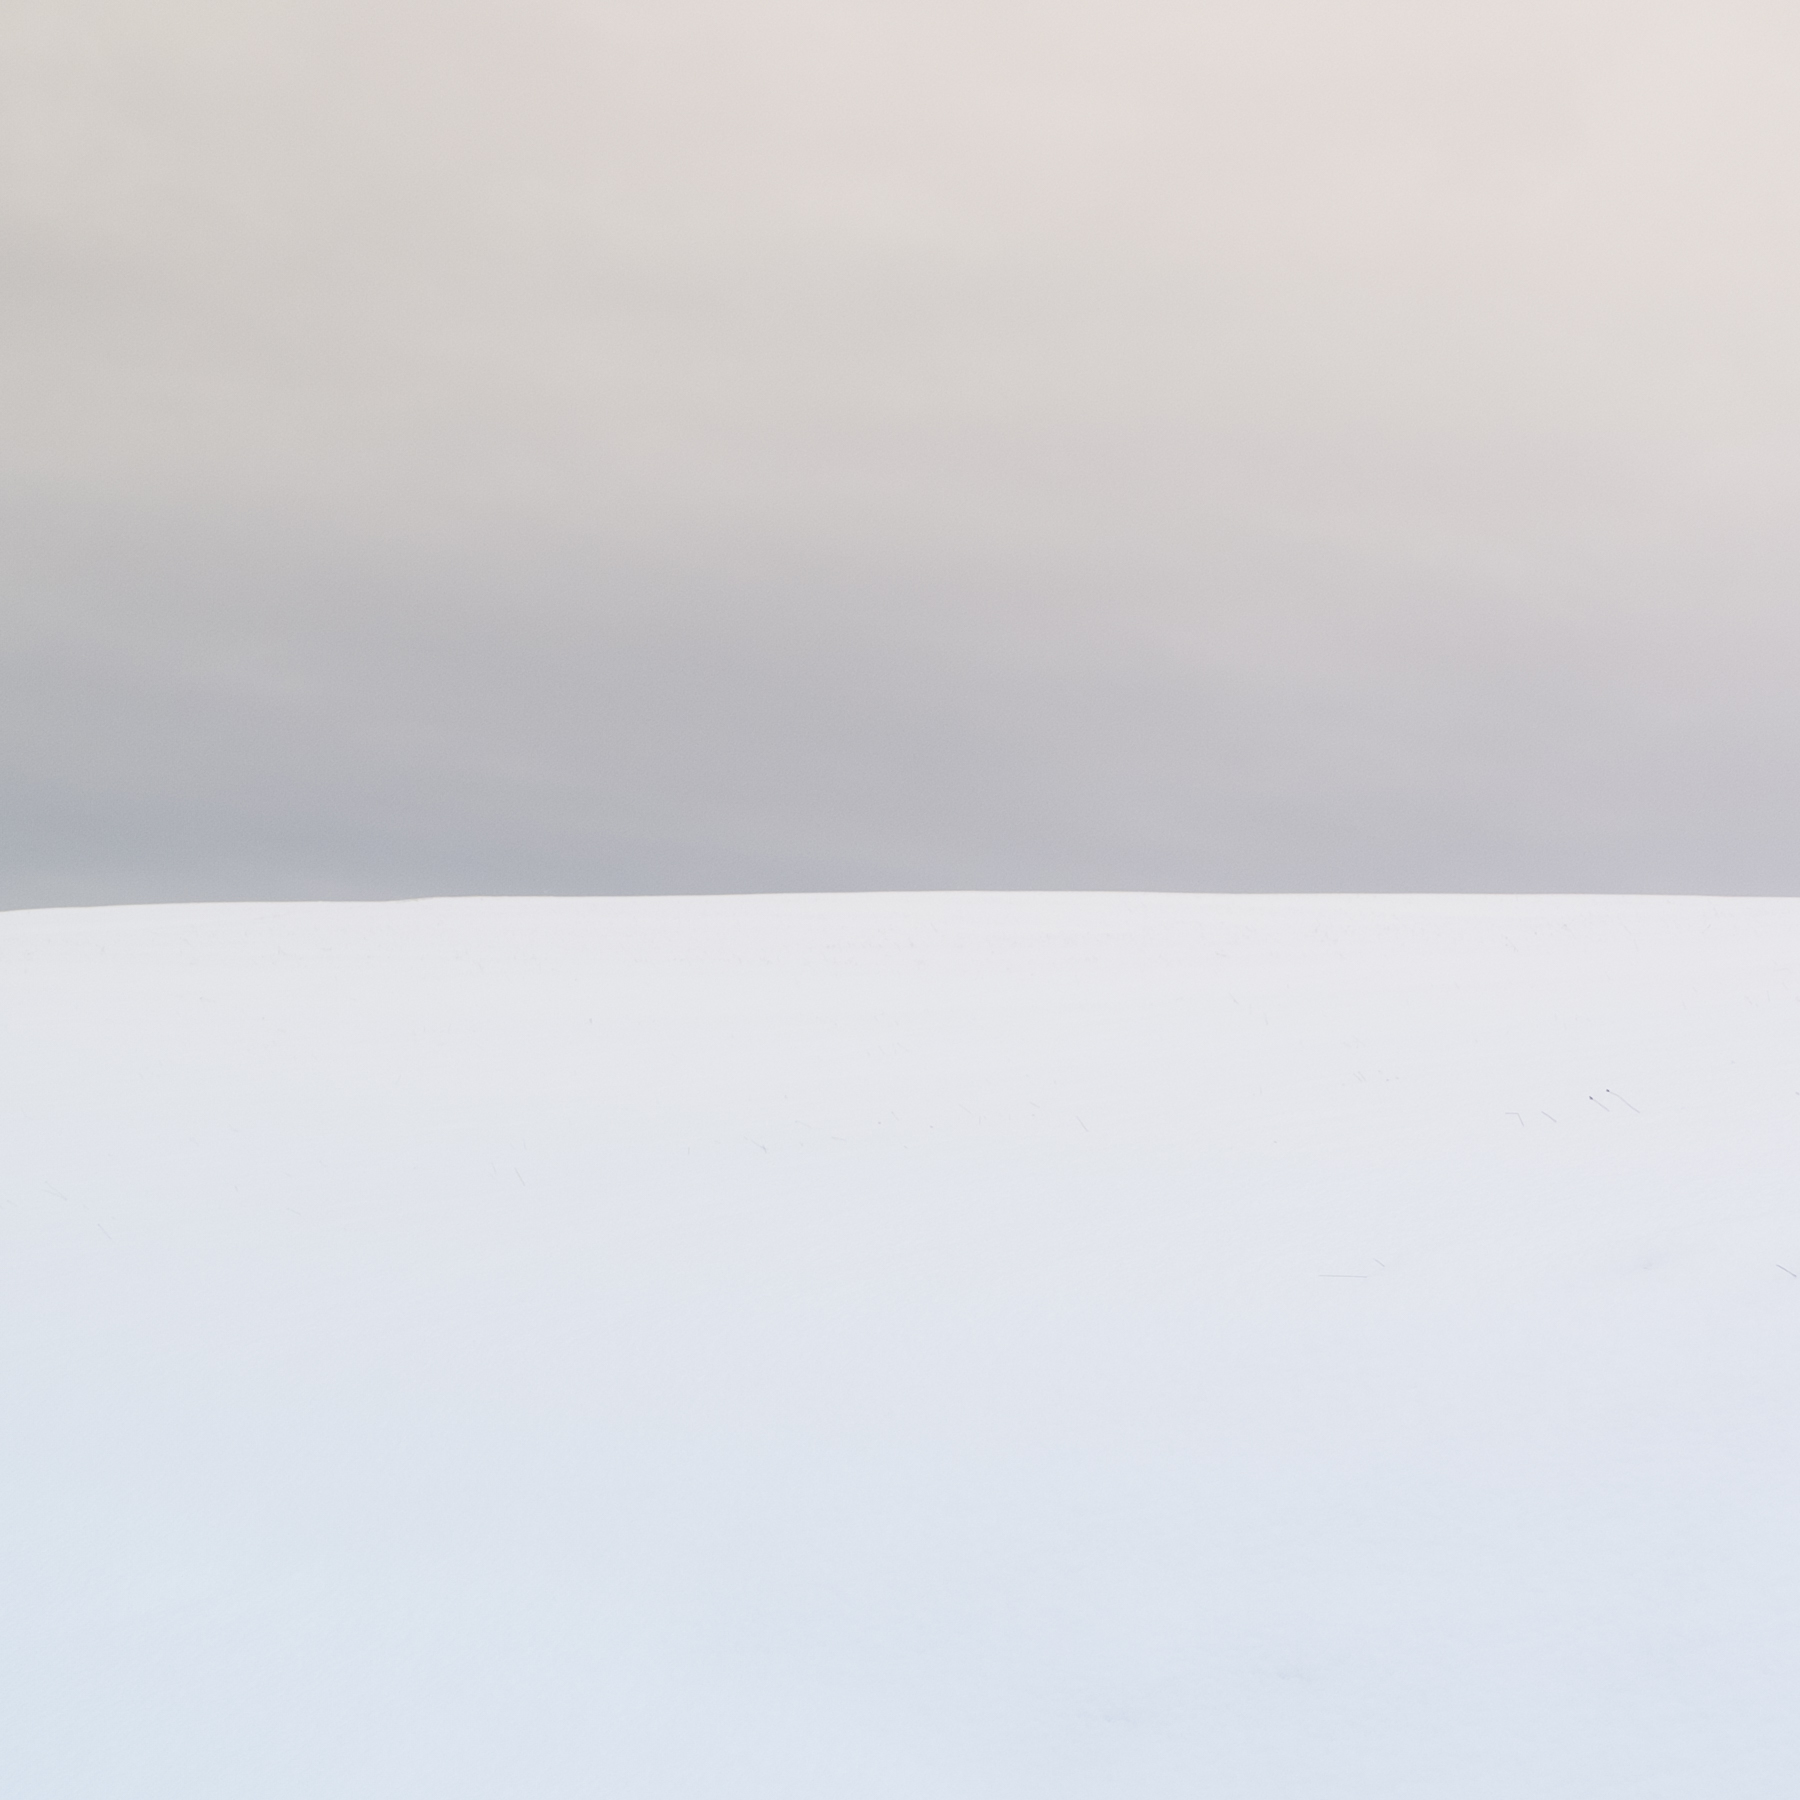 Schwarzwald Snowscape 2